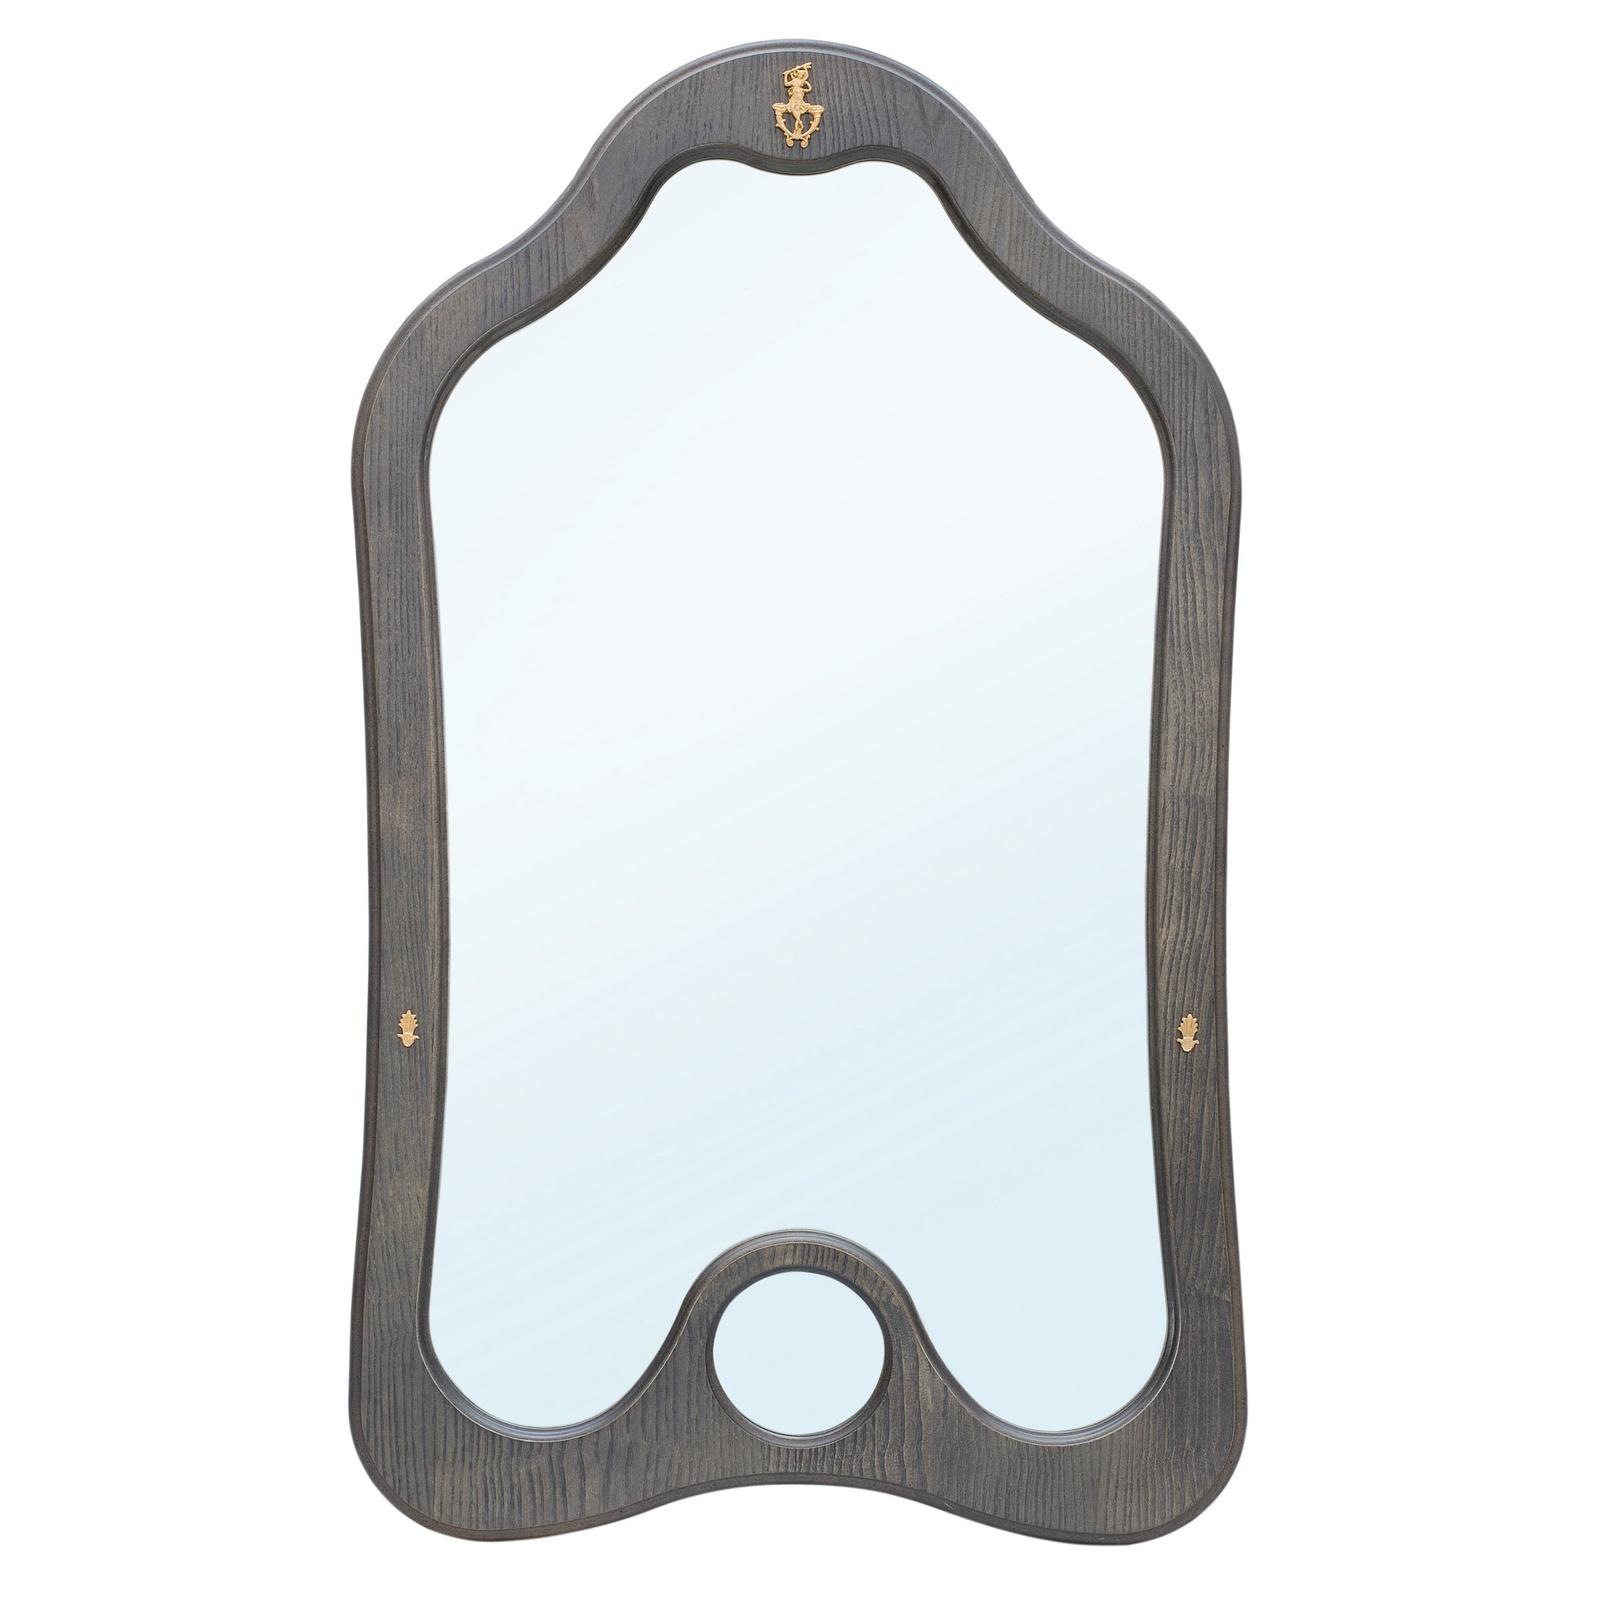 Зеркало настенное Висан Джульетта, серый висан банкетка висан джульетта орех qphyt qy